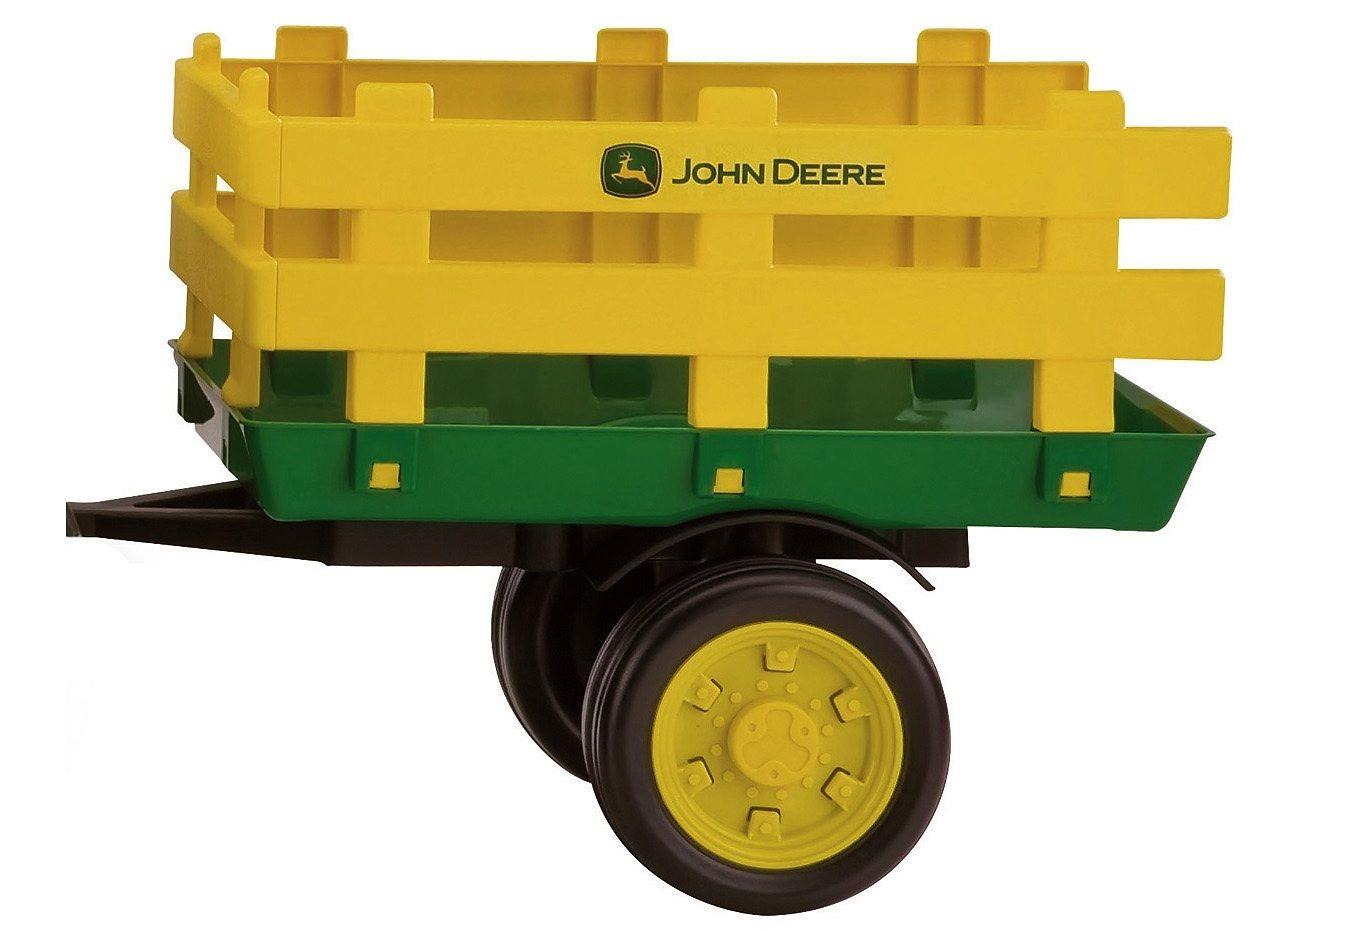 Peg-Pérego Anhänger für Elektrofahrzeug Traktor 6V Power Pull, »StakeSide - John Deere«